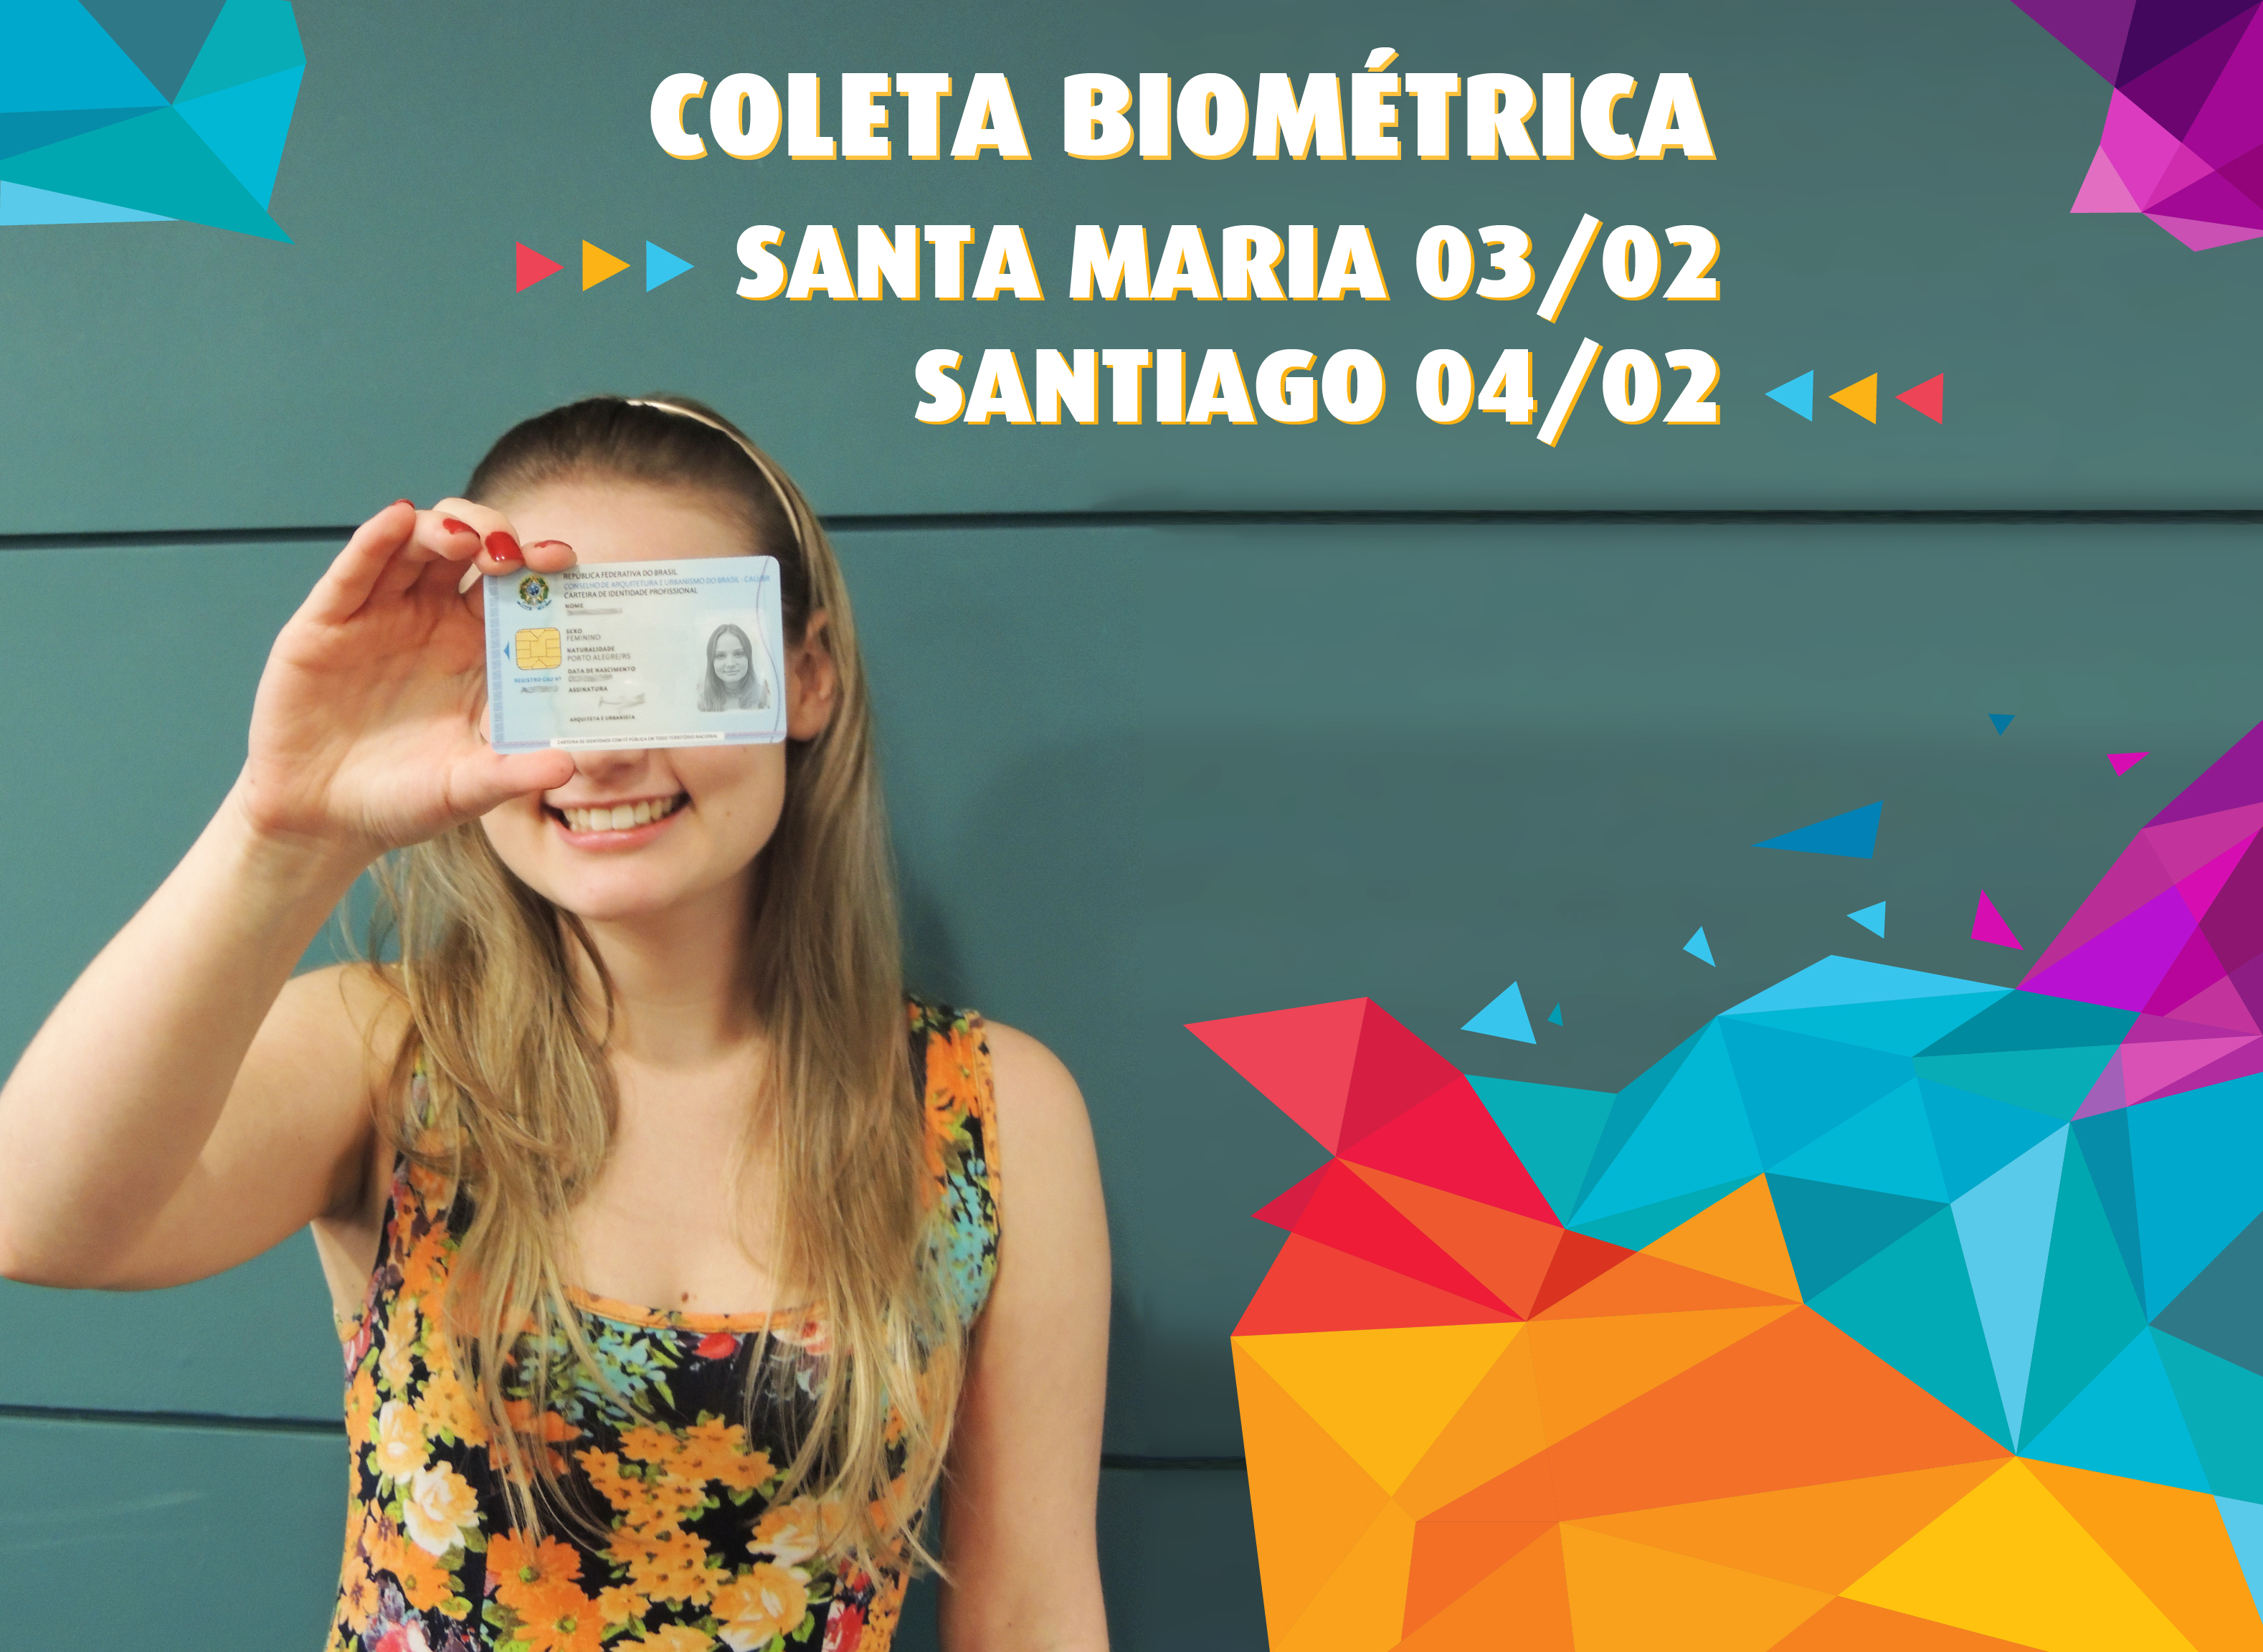 Coleta biometrica Santa Maria e Santiago